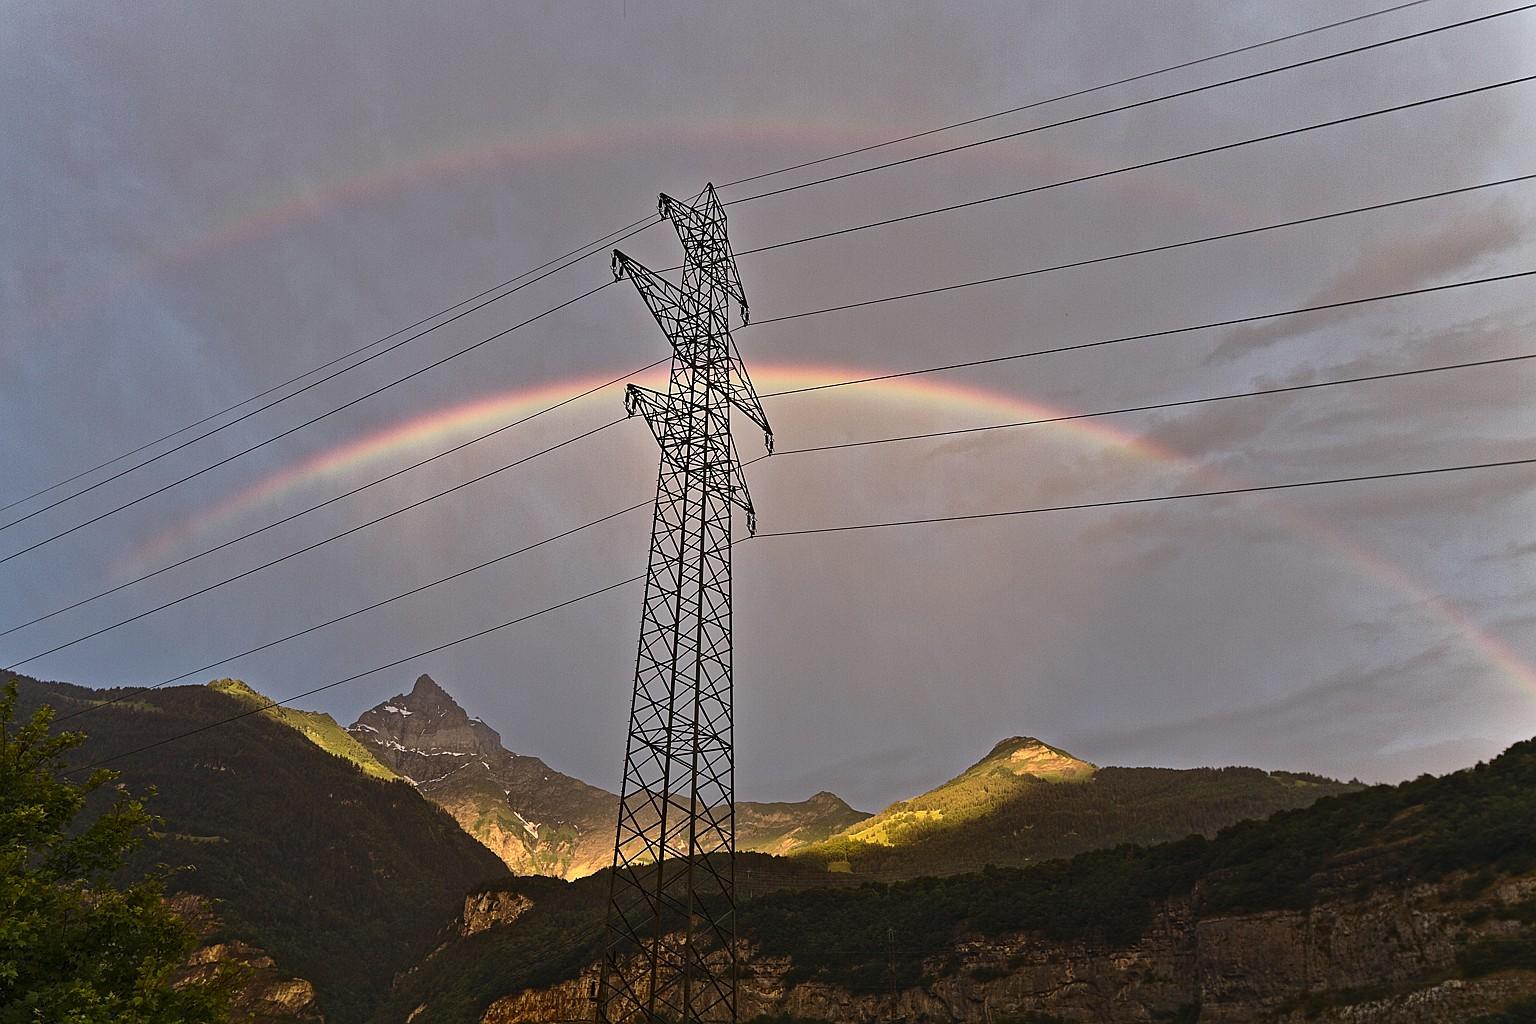 180705_0337 - Dents Du Midi - Rainbow